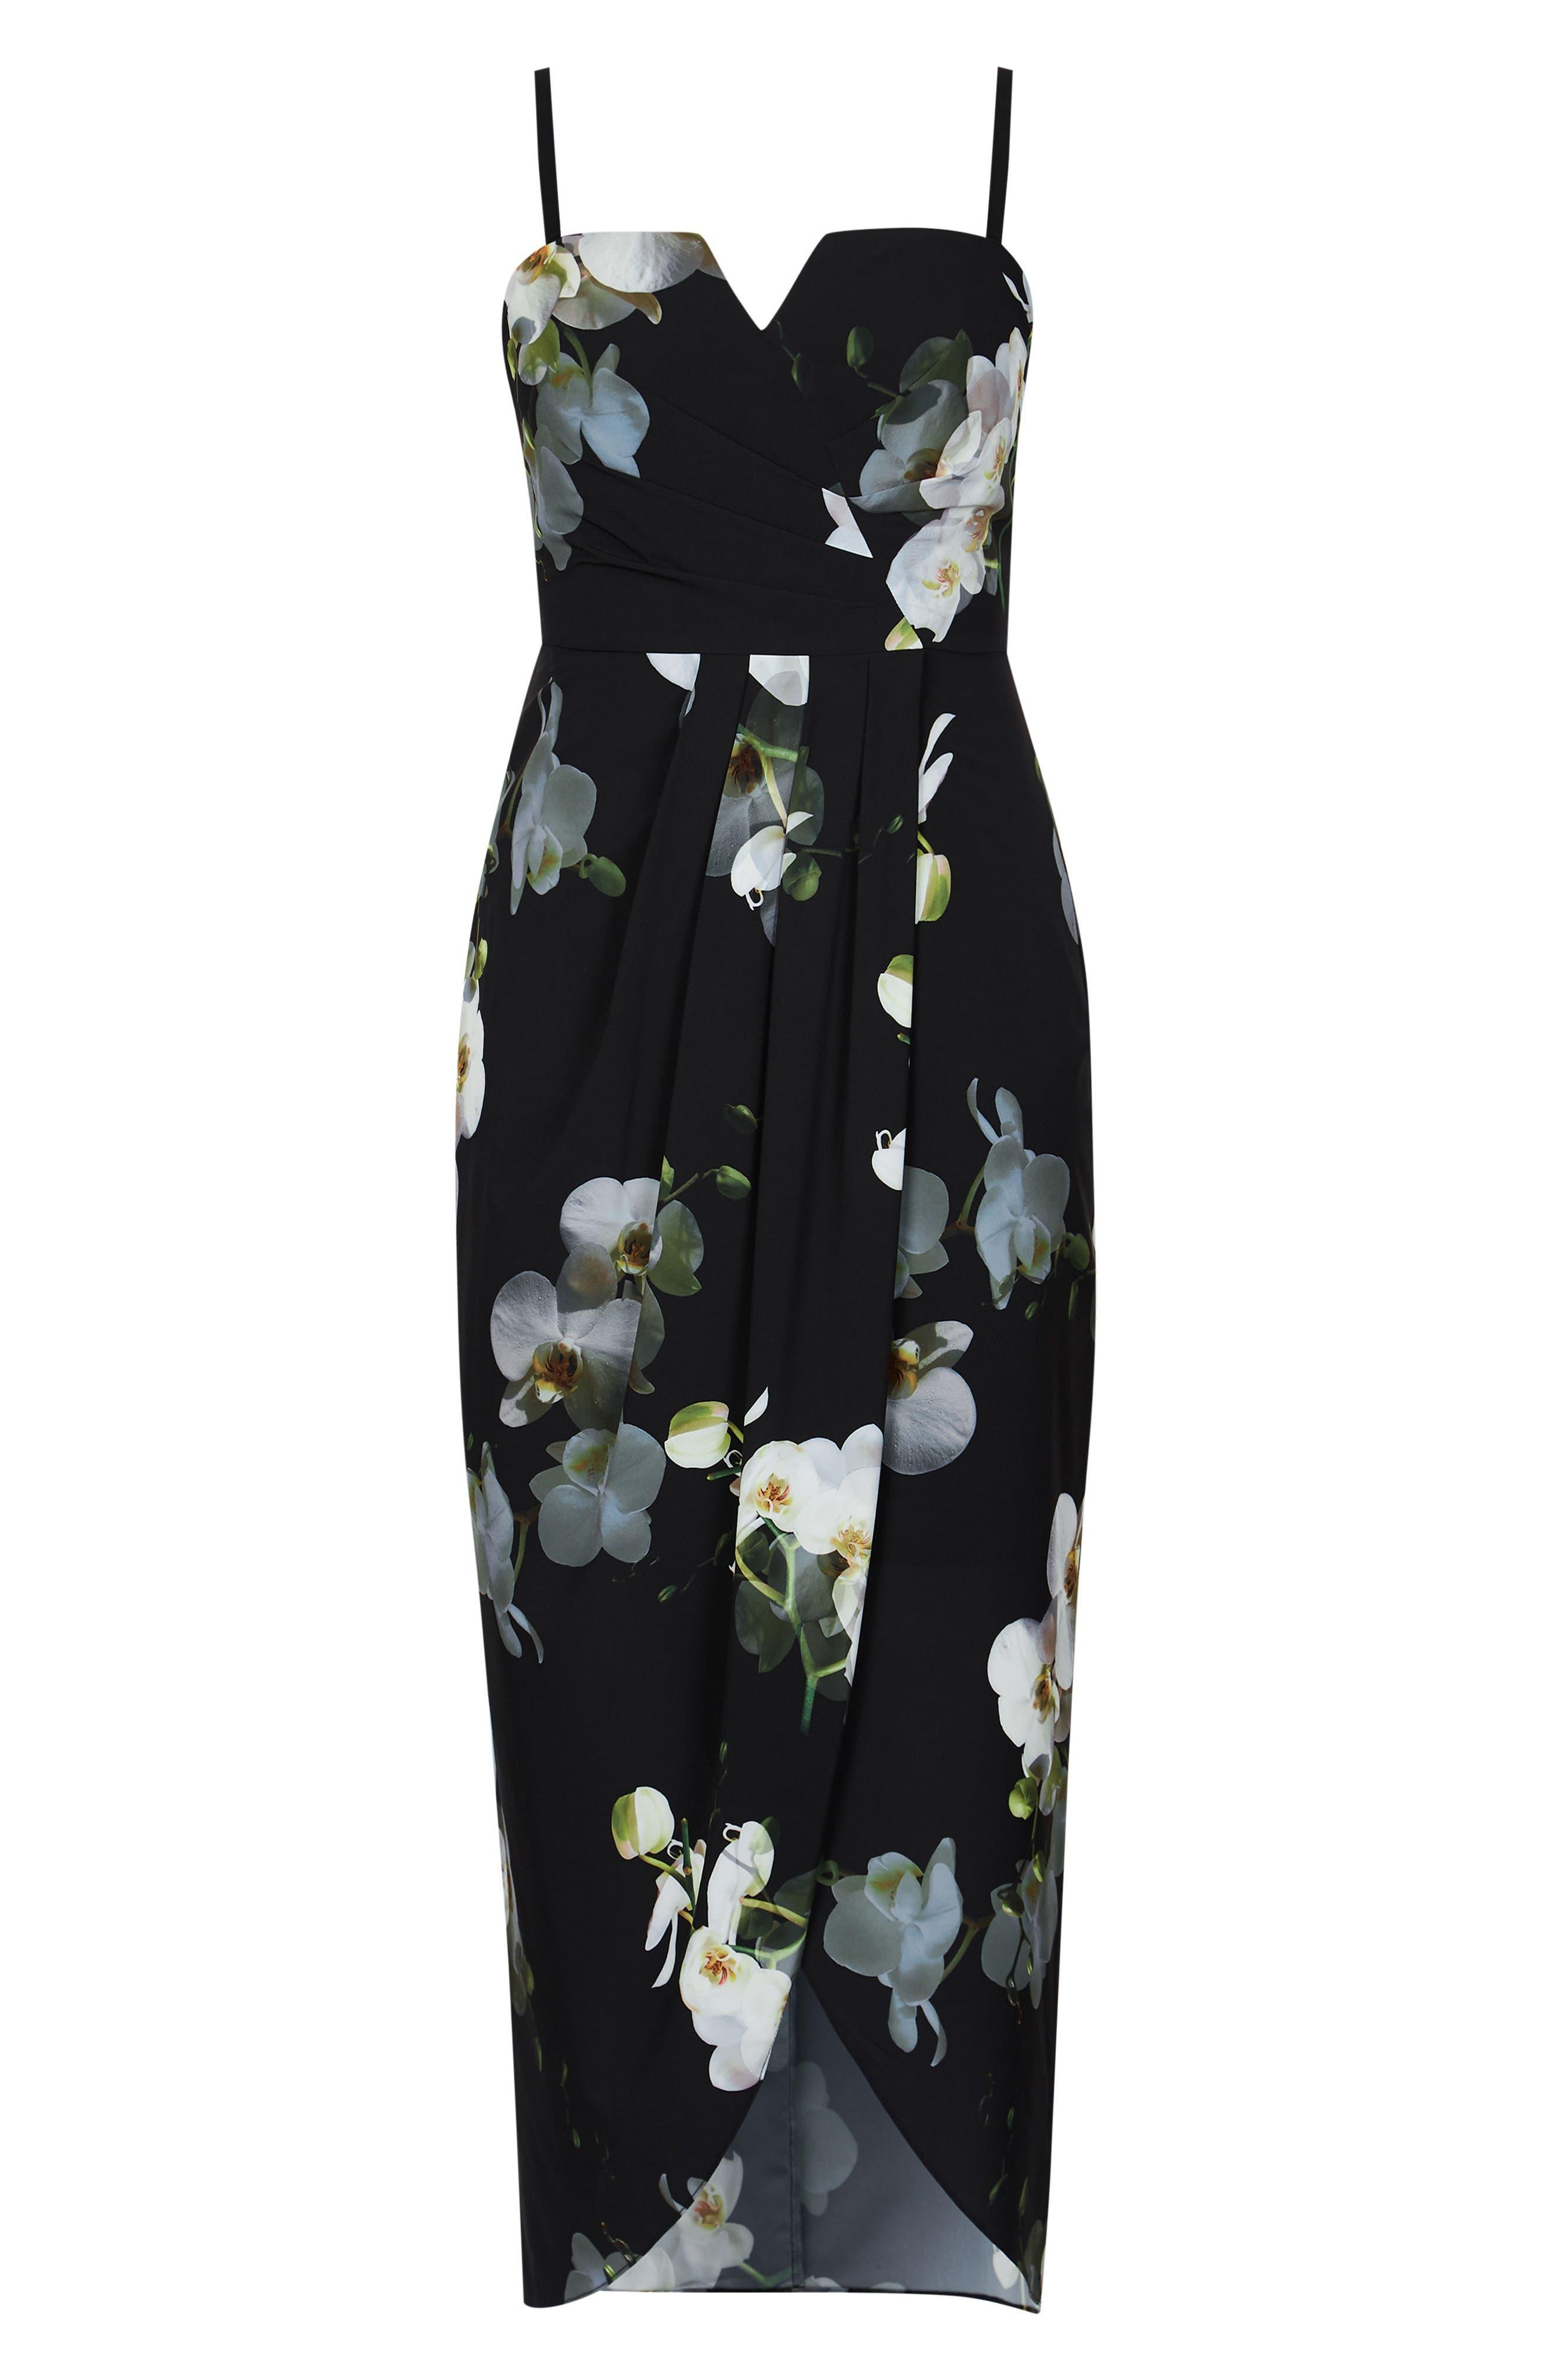 Orchid Dreams Strapless Maxi Dress,                             Alternate thumbnail 5, color,                             ORCHID DREAMS